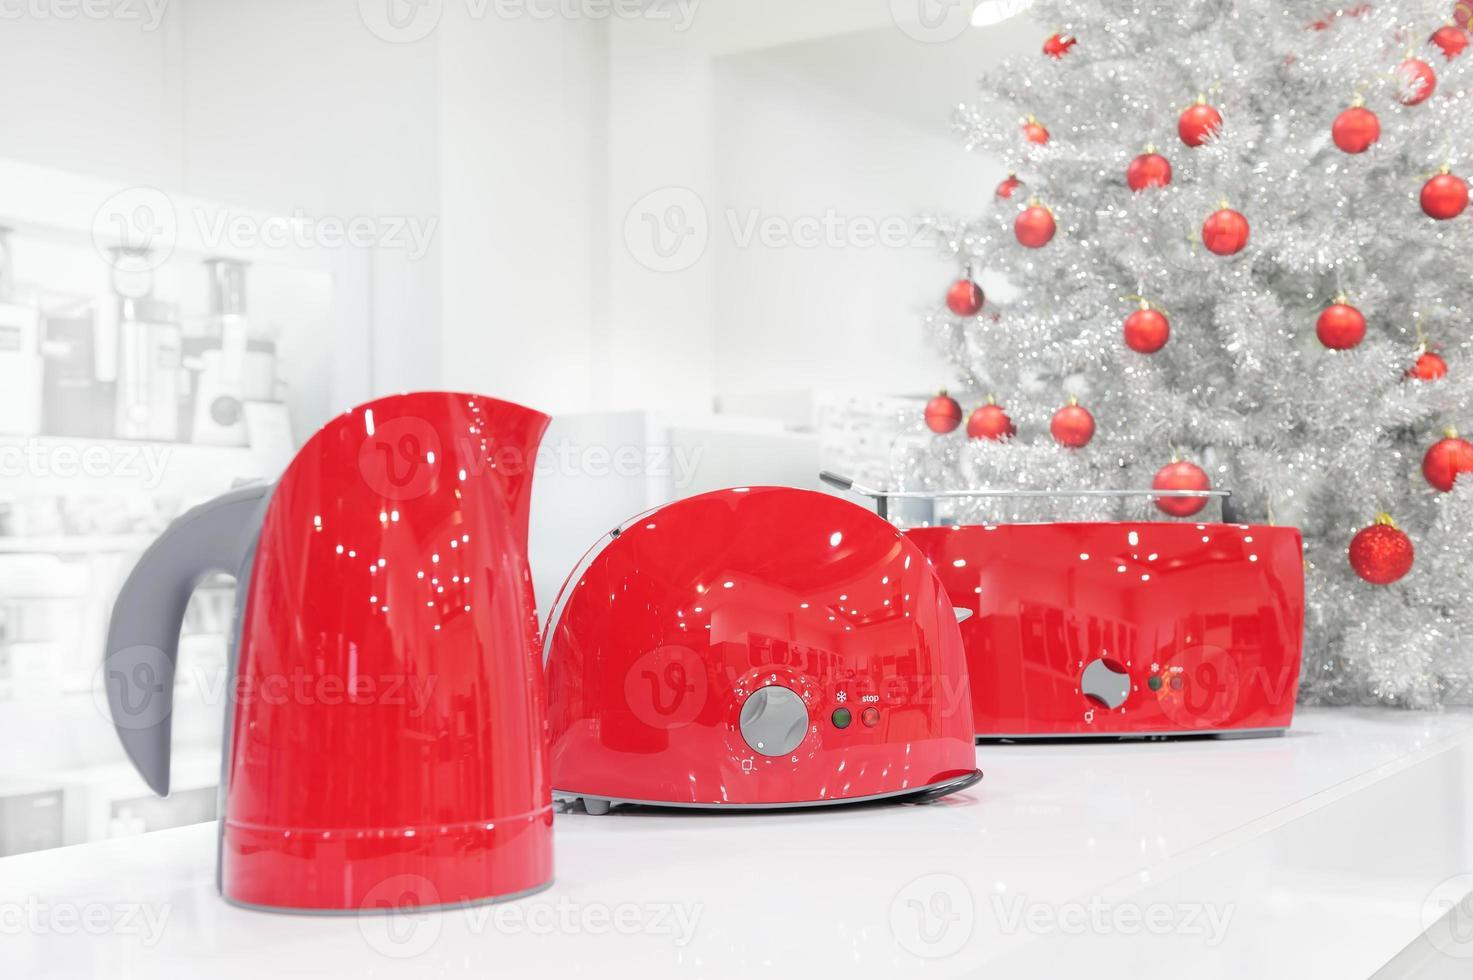 hushållsapparater butik vid jul foto